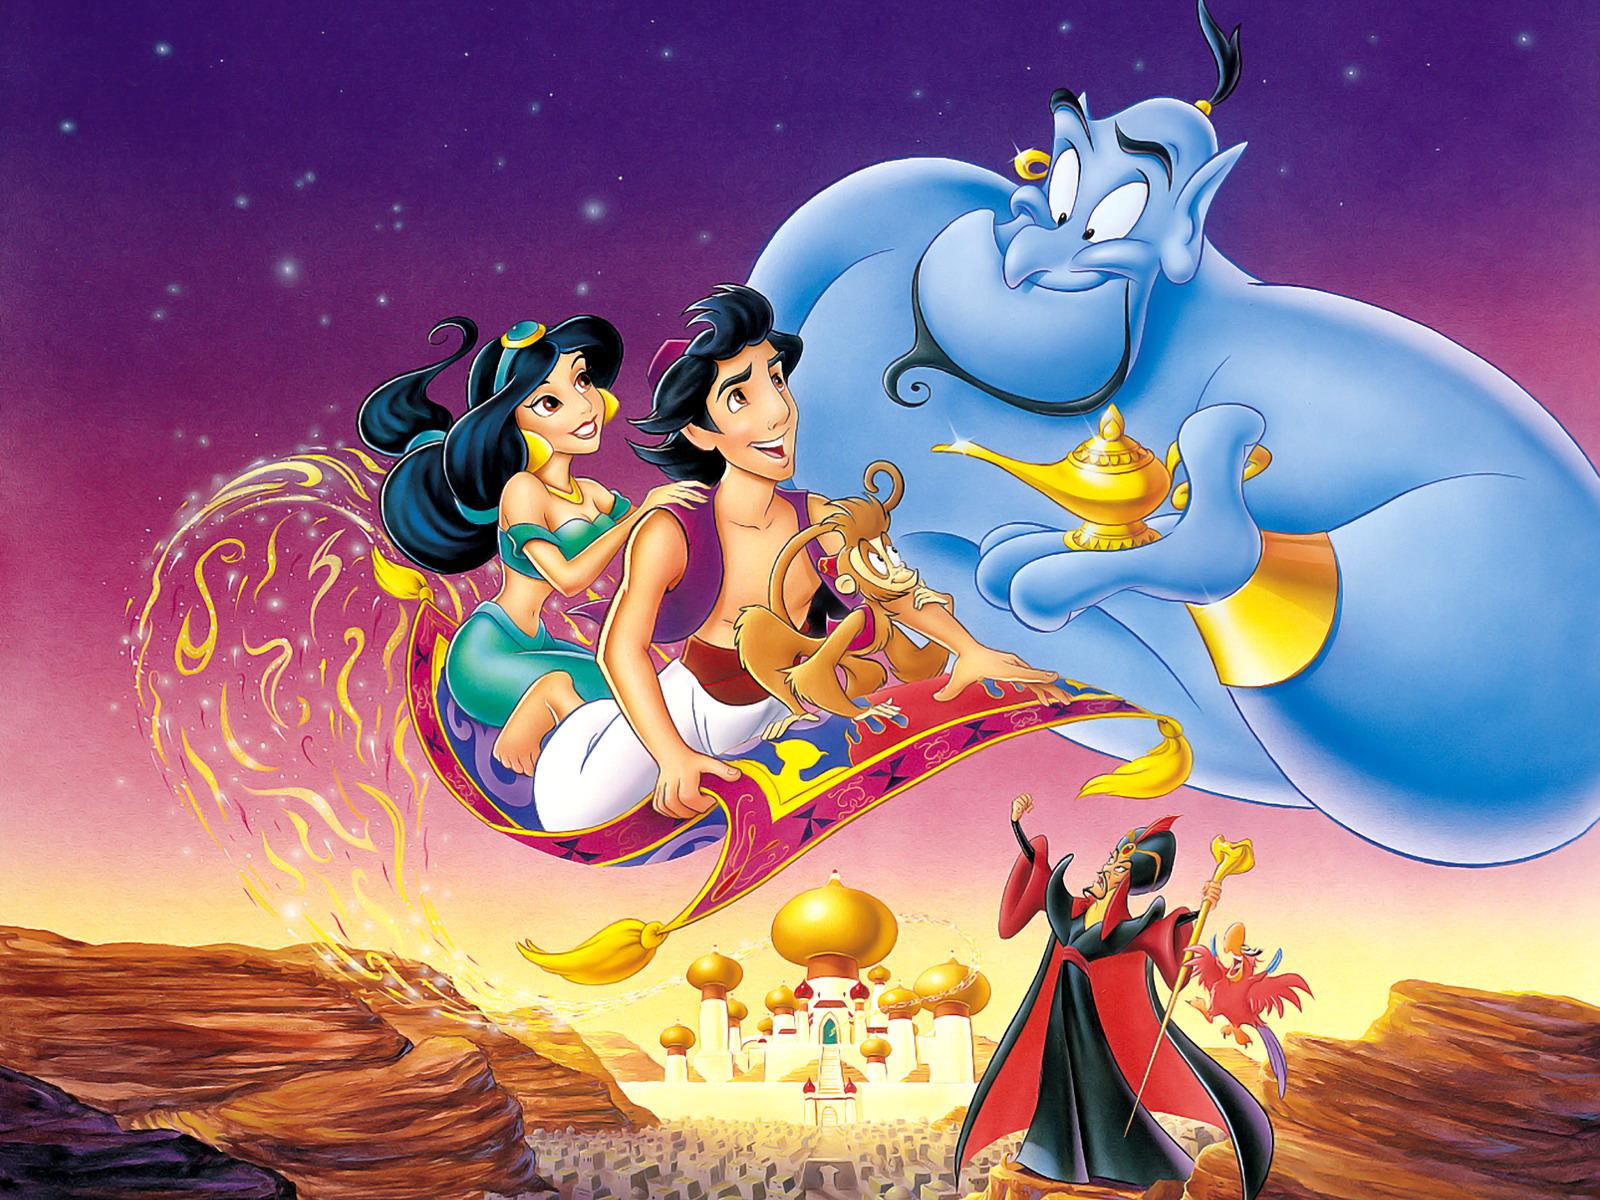 Wallpaper Aladdin Jasmine Genie 1600x1200 Wallpaperup